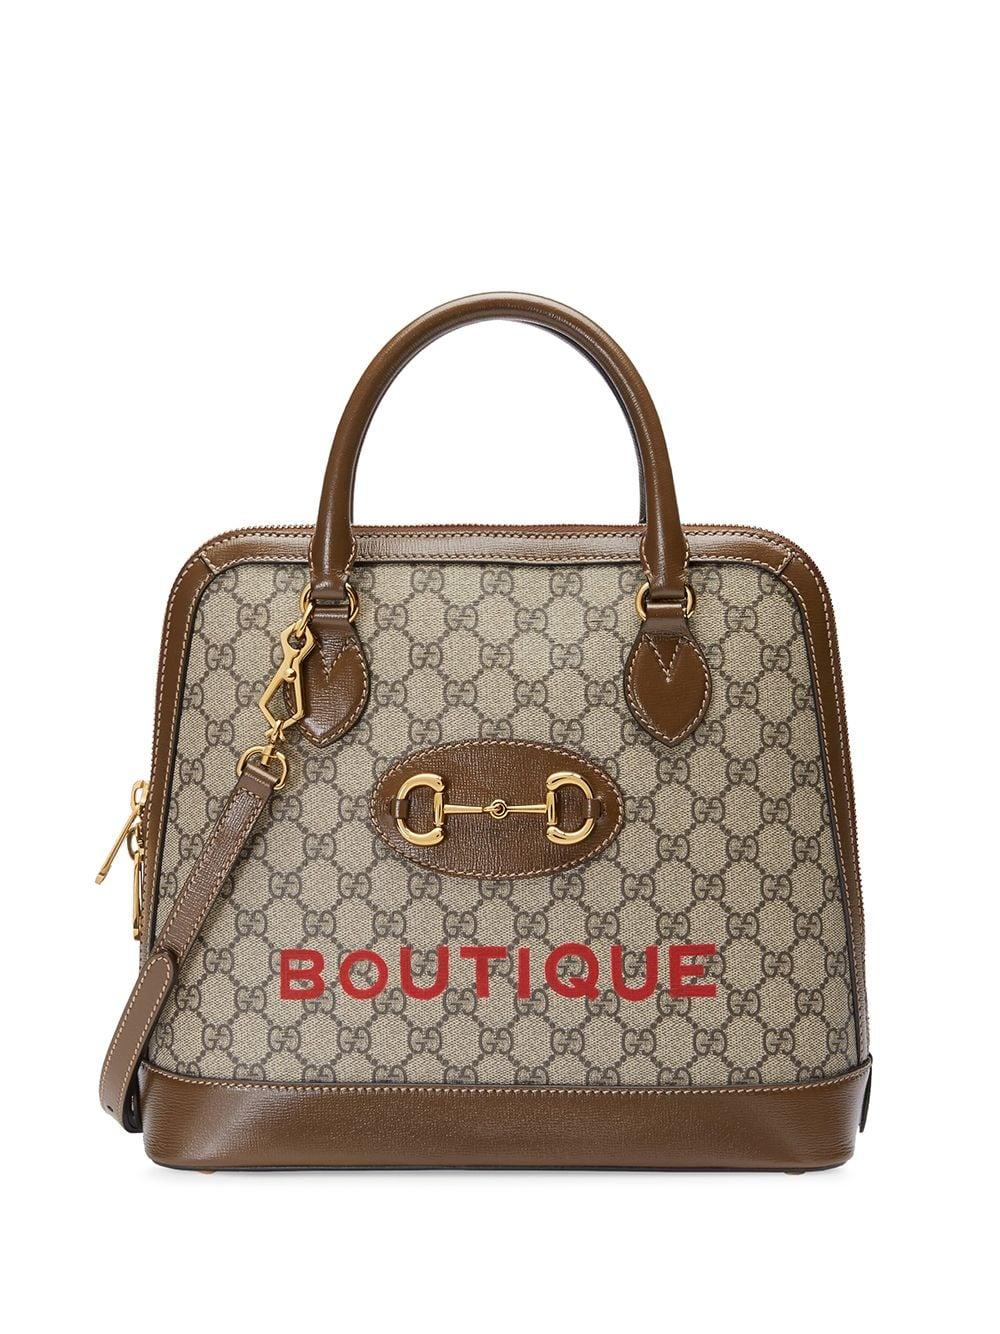 Horsebit Leather Handbag